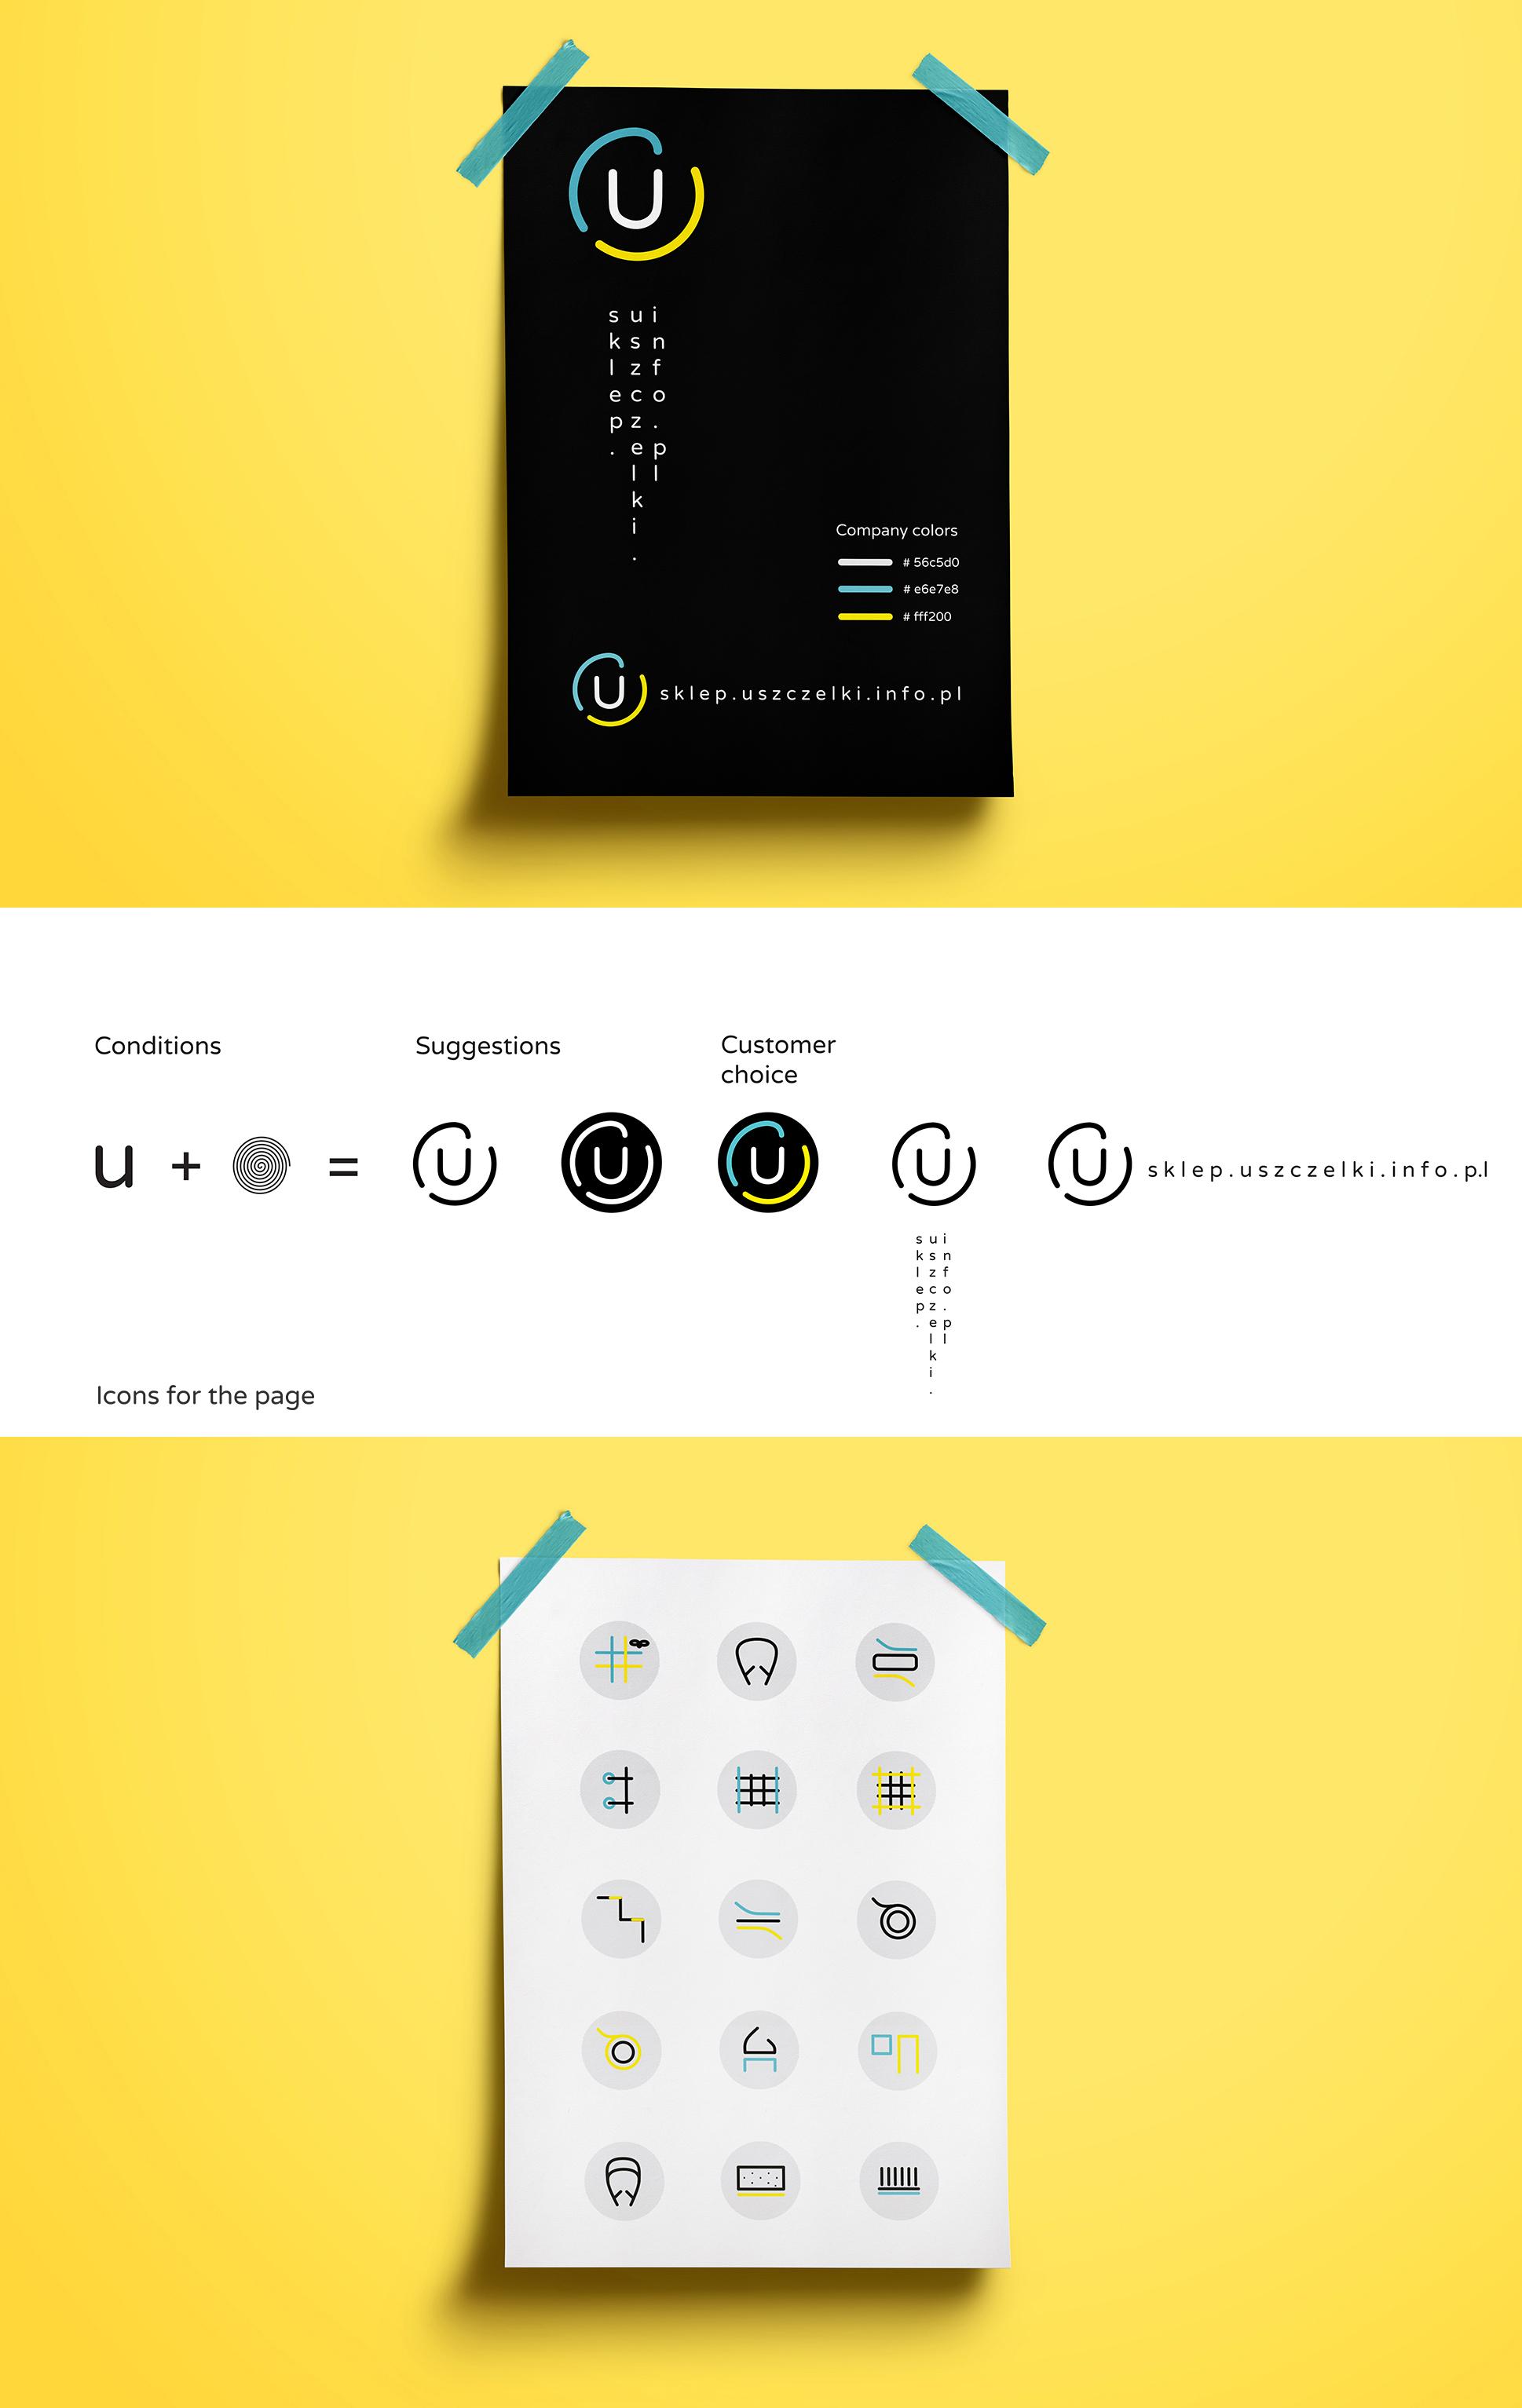 logo-branding-identification-icons-for-the shop-n-pawlowska-design